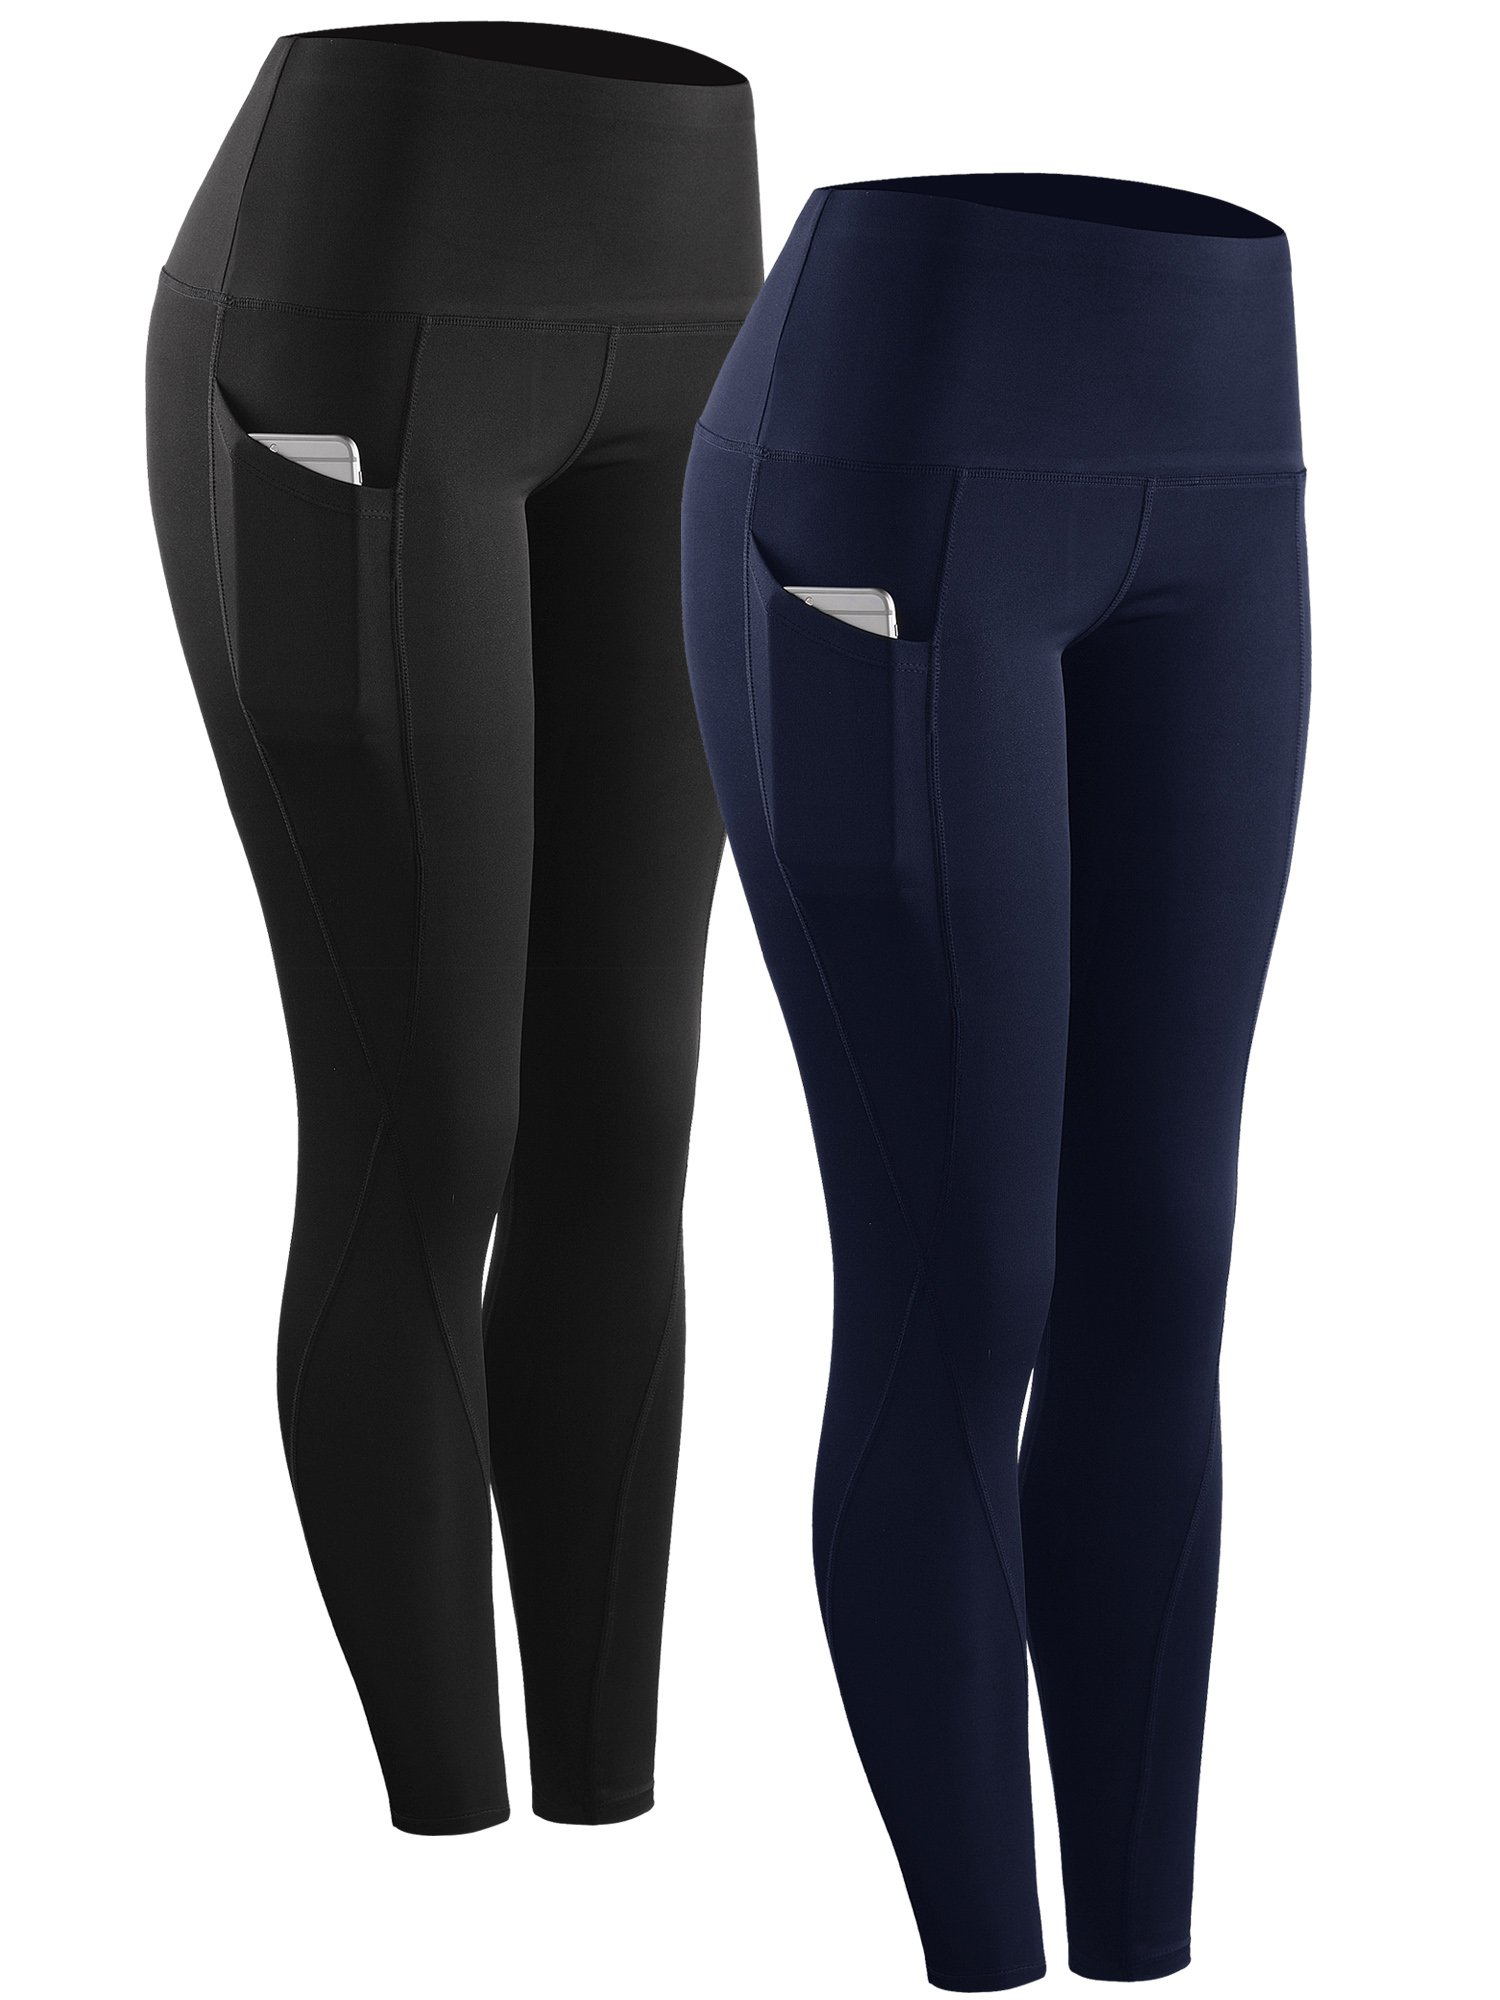 Neleus 2 Pack Tummy Control High Waist Running Workout Leggings,9017,2 Pack,Black,Navy Blue,M,EU L by Neleus